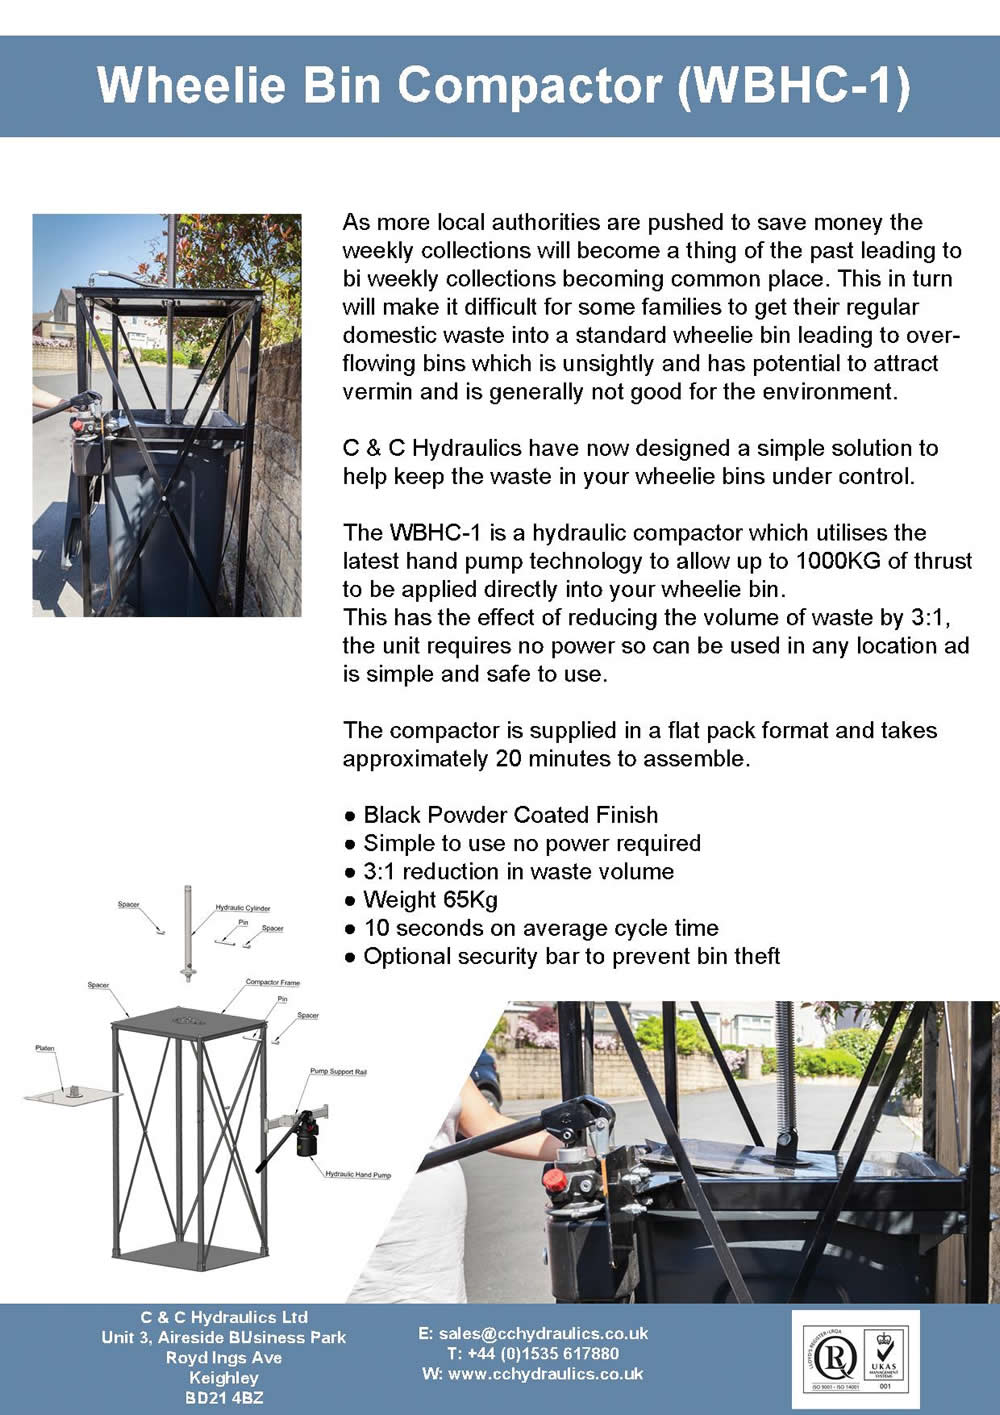 wheelie bin compactor